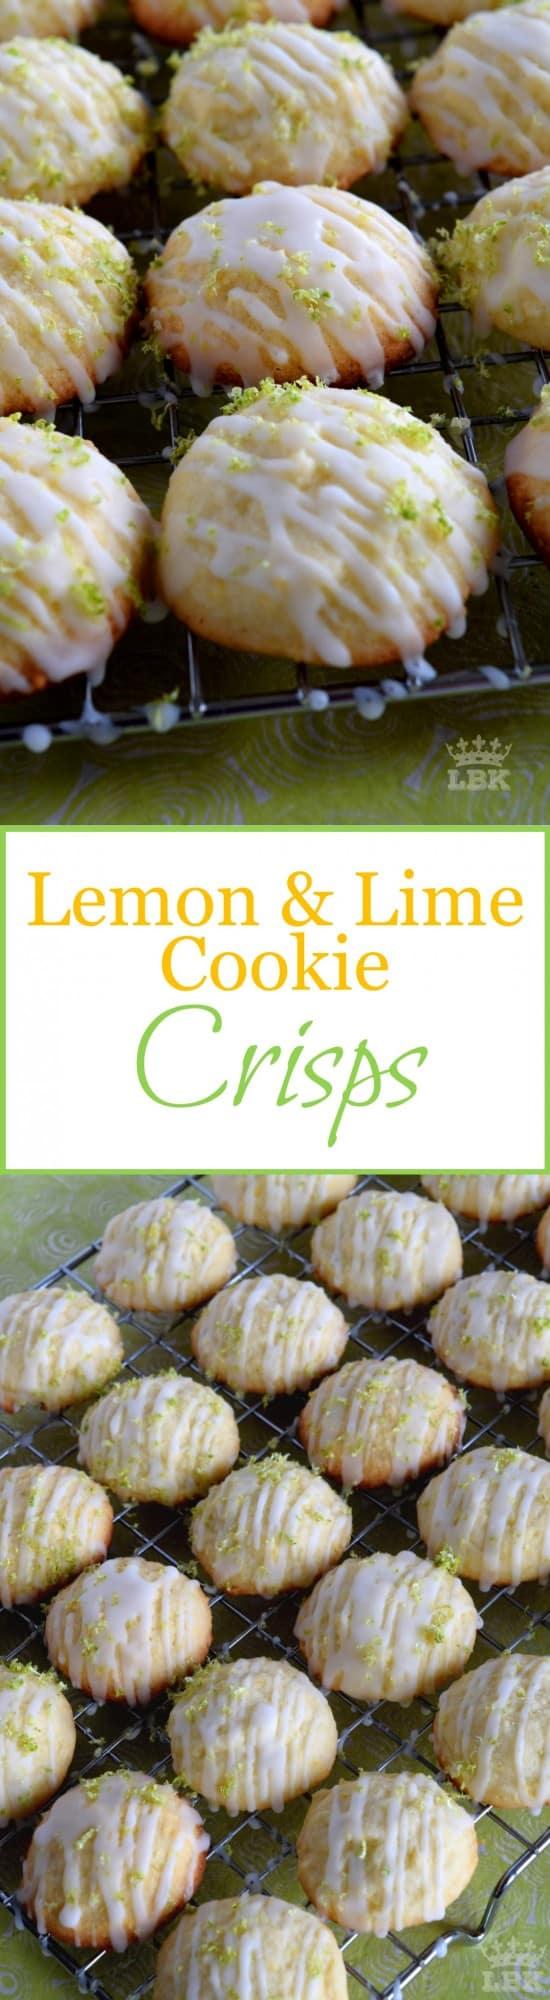 Lemon and Lime Cookie Crisps